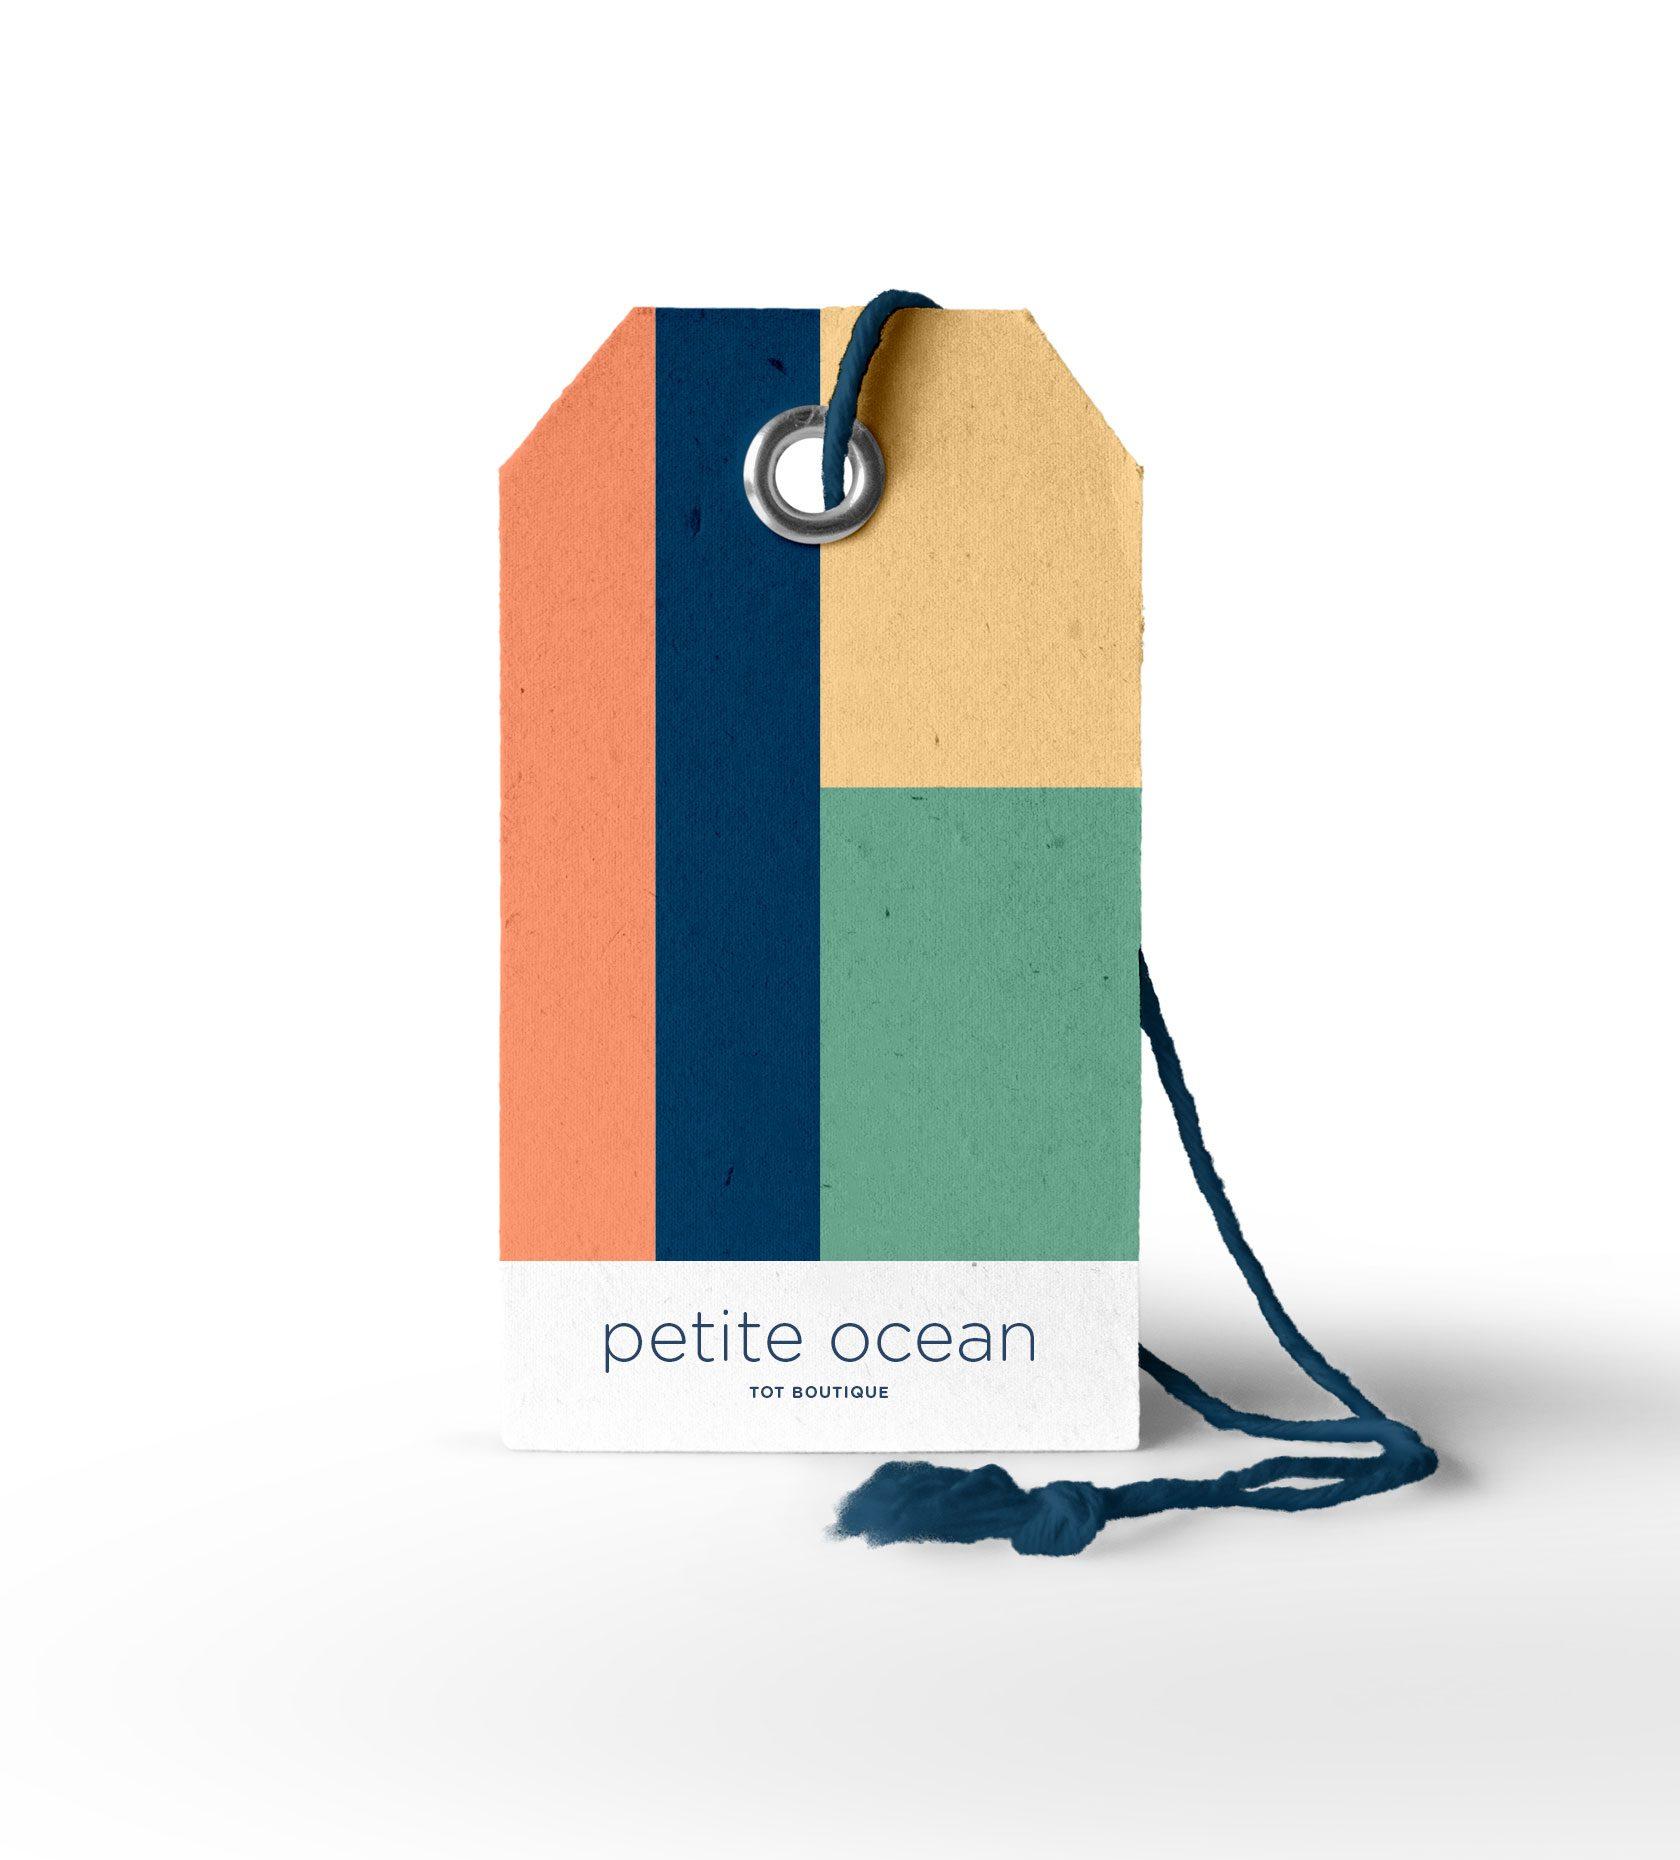 Petite Ocean Clothing Label Design by Furia